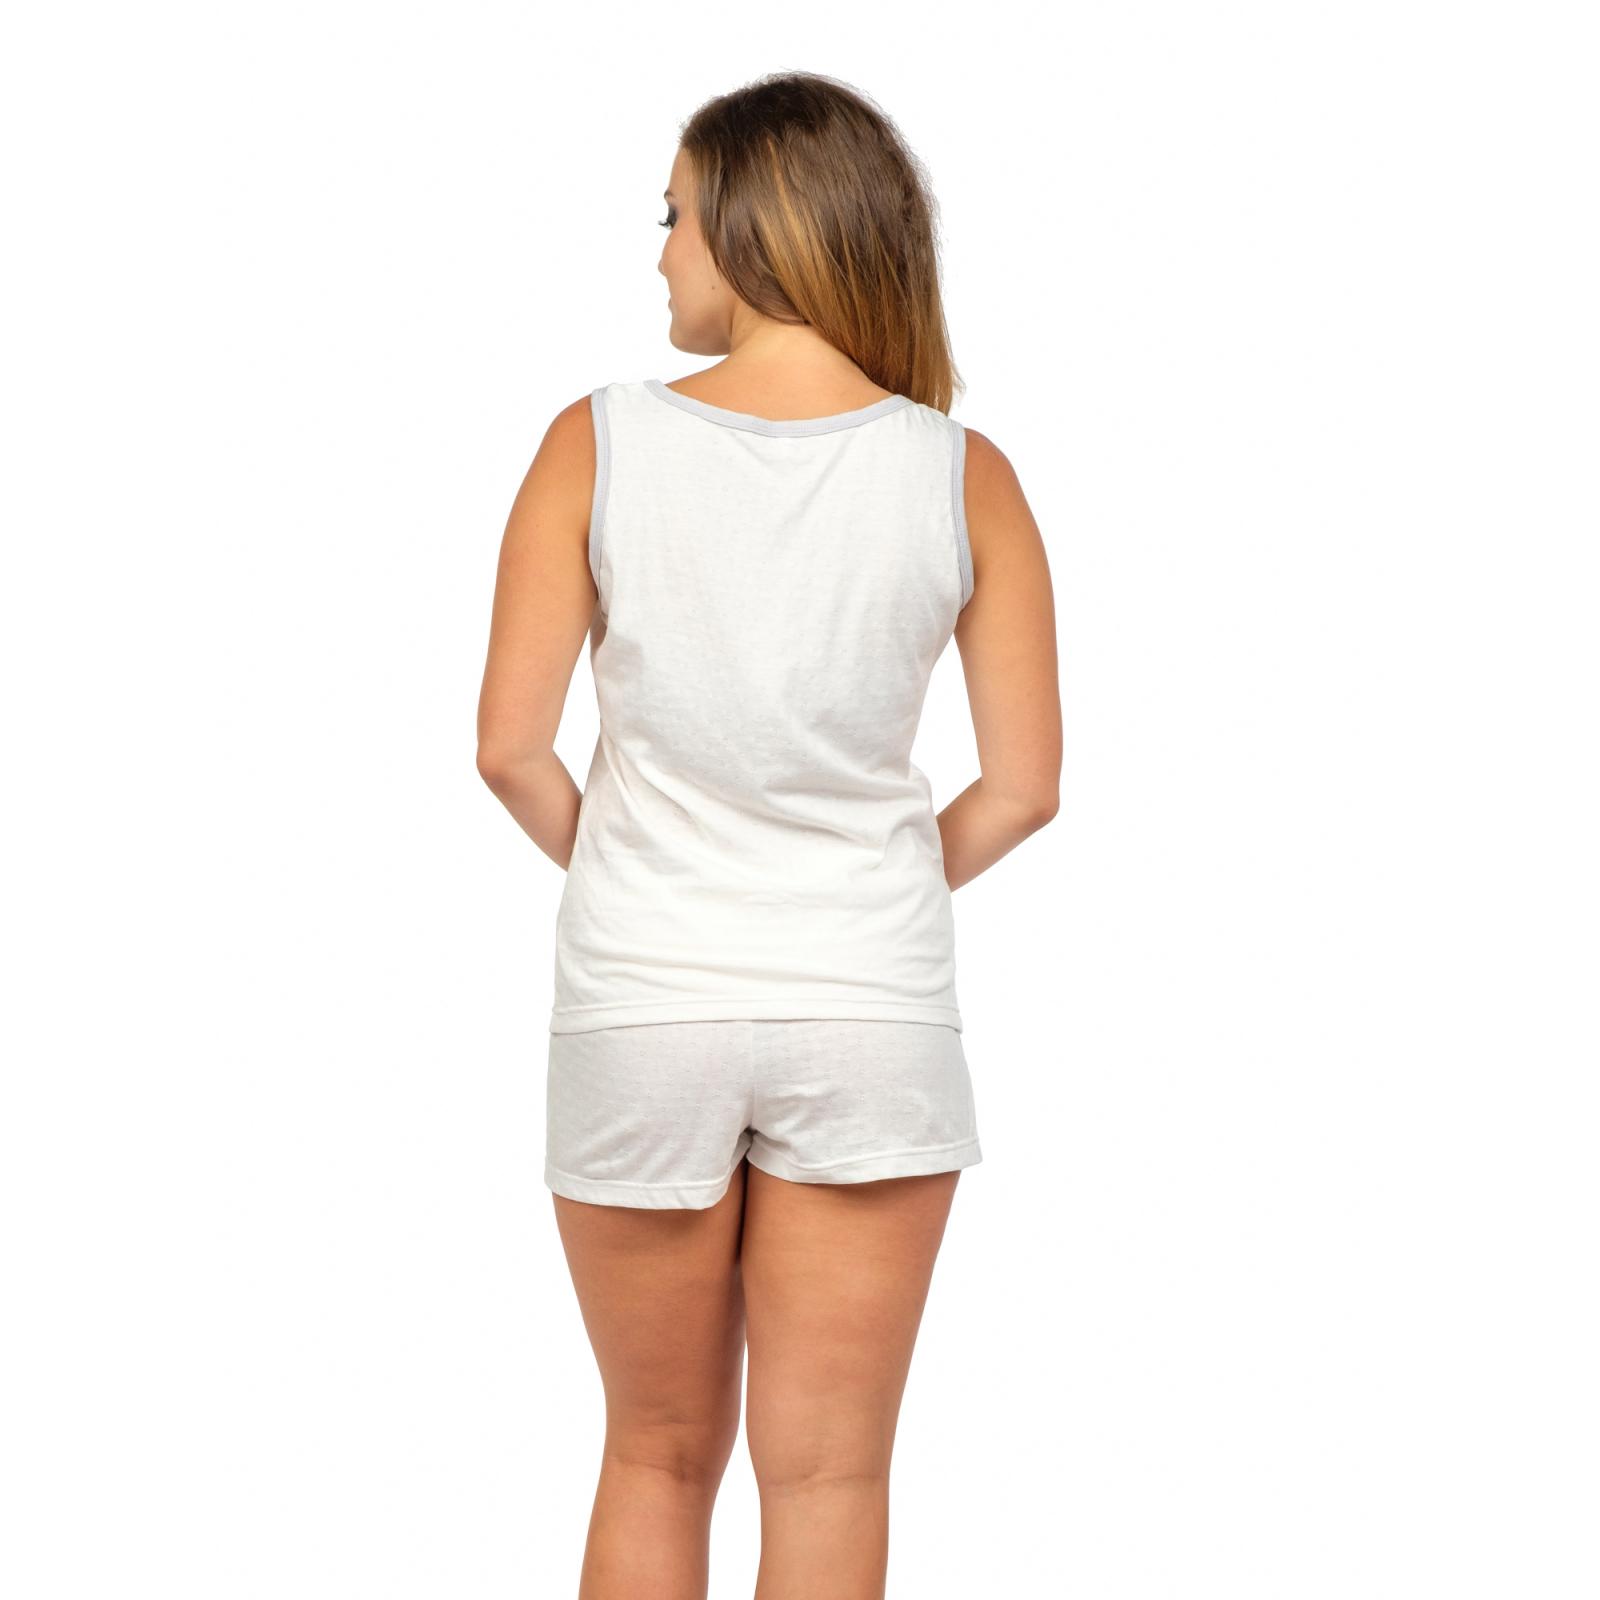 Пижама (белая с гипюром) Мария М-0127Б